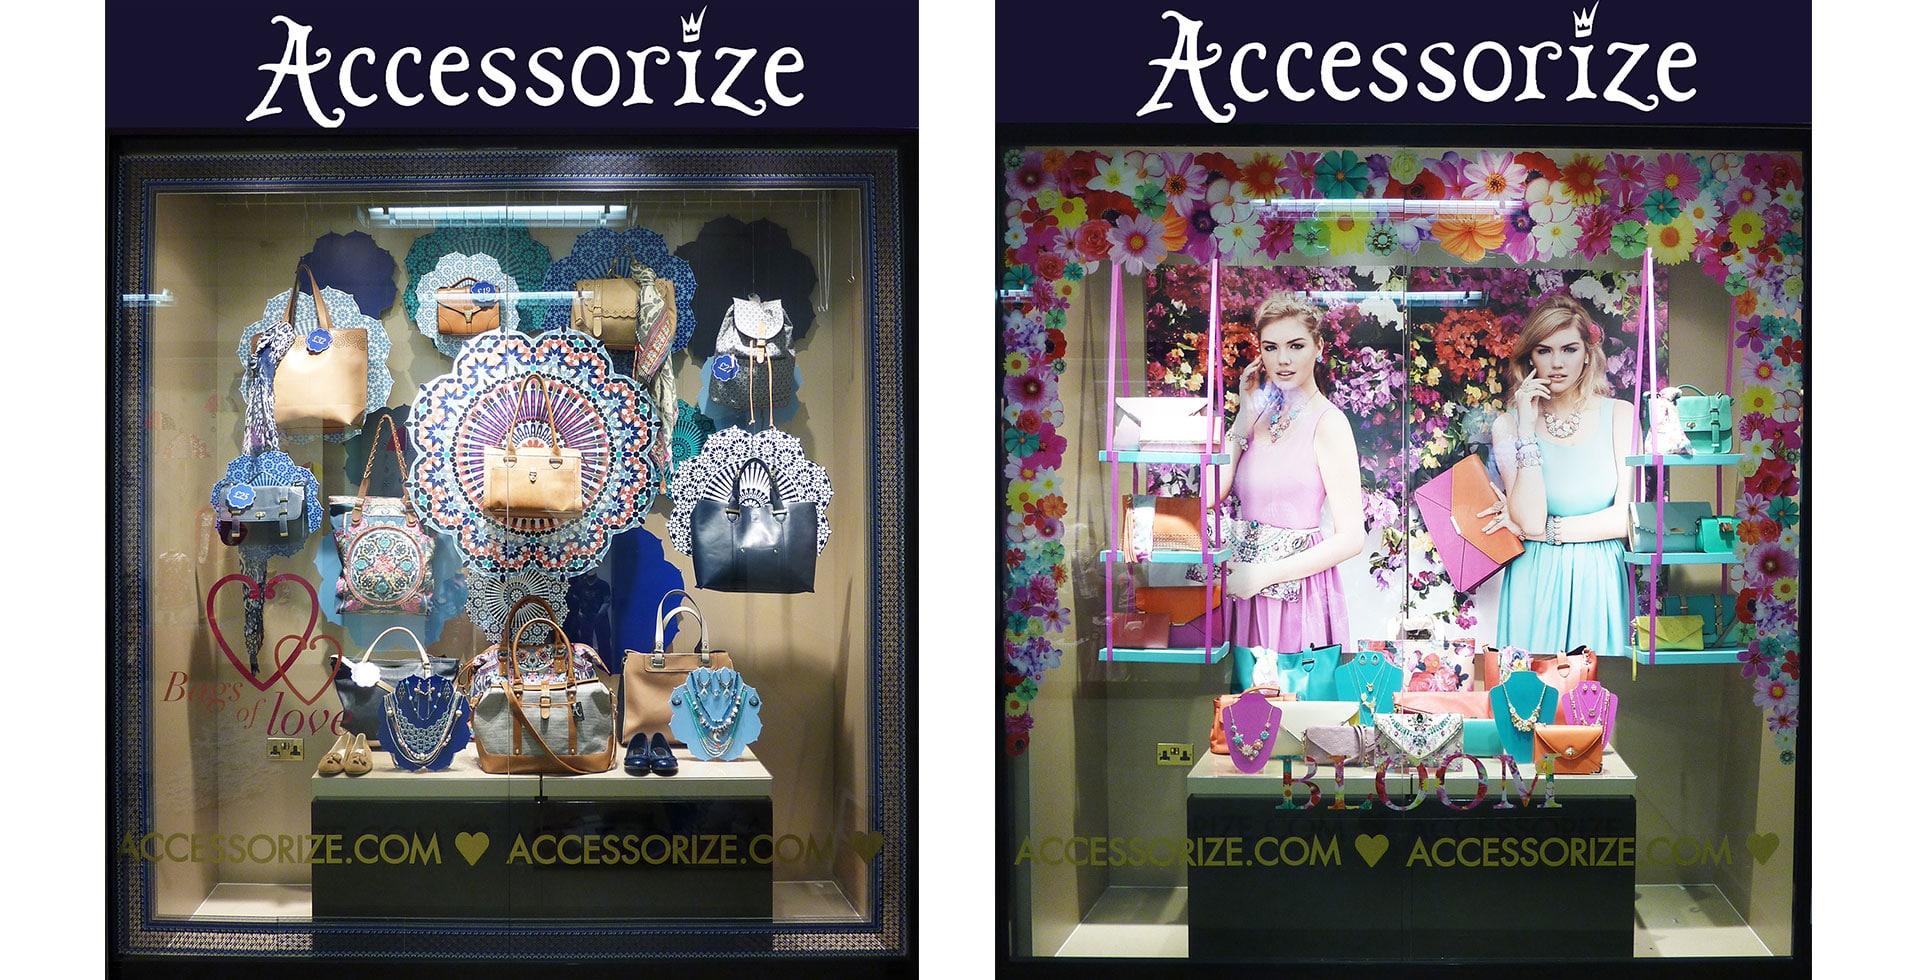 Accessorize windows